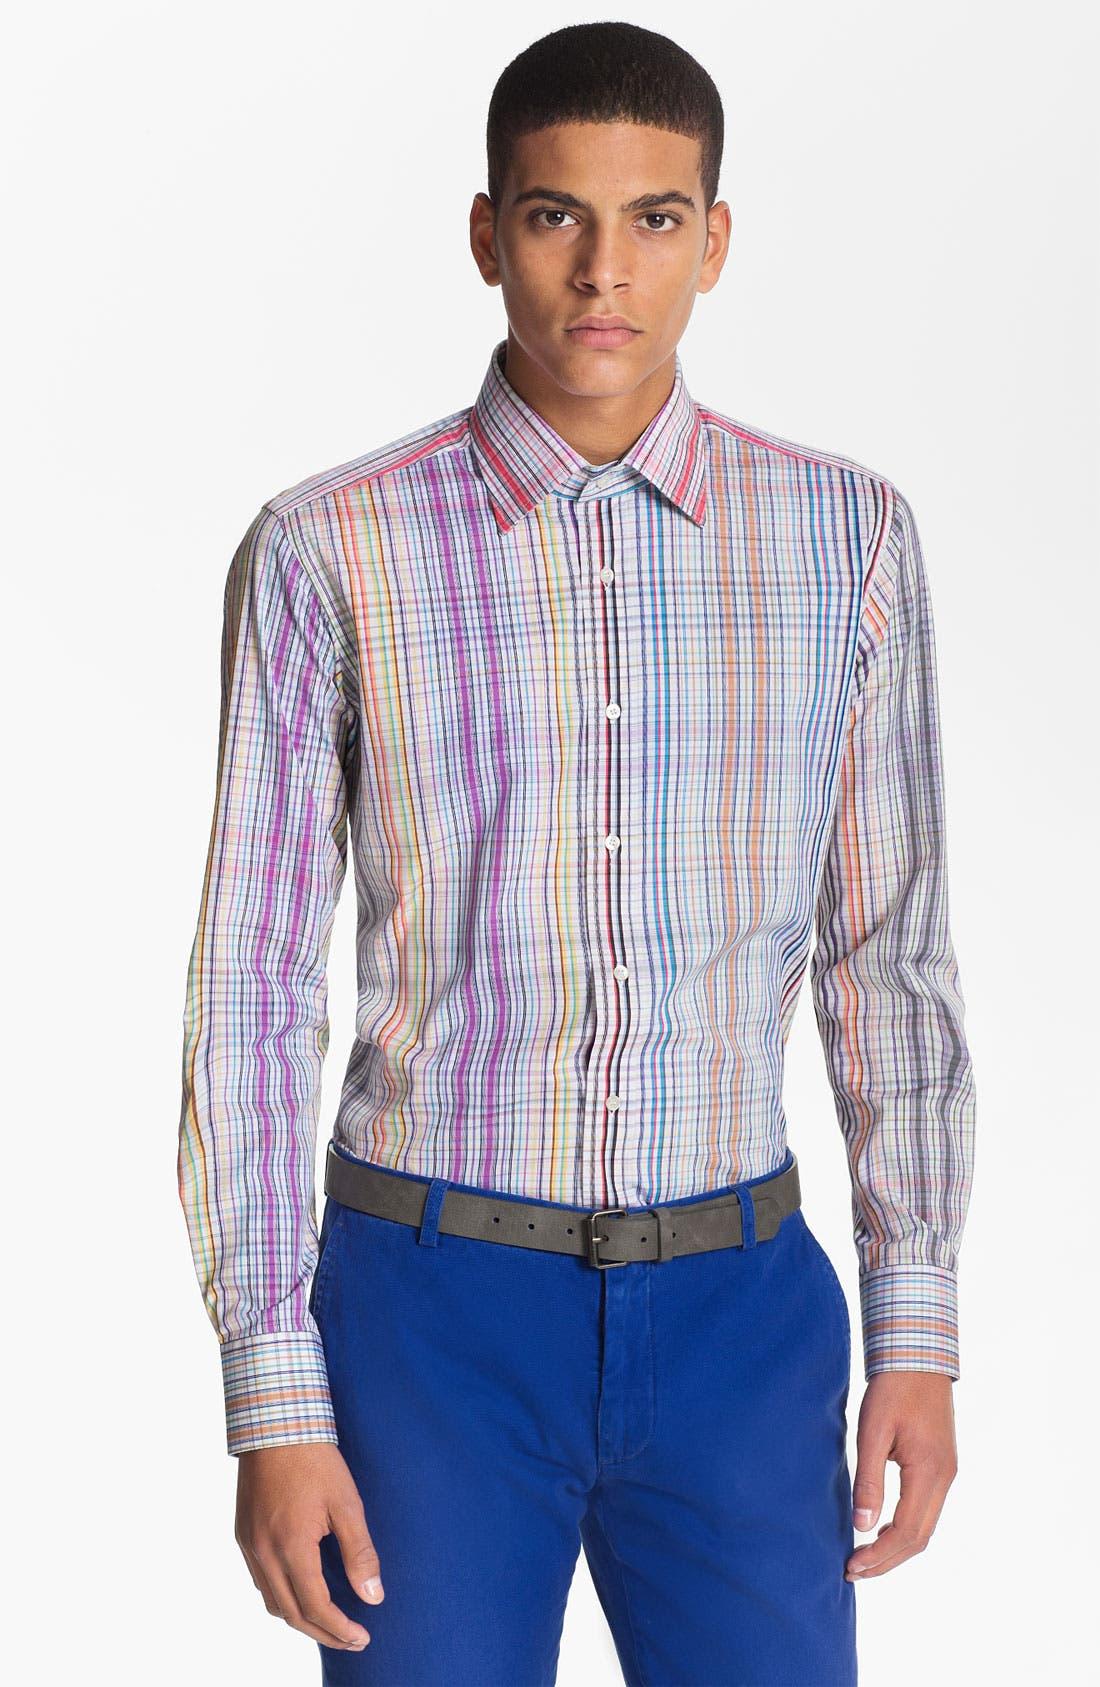 Alternate Image 1 Selected - Etro 'Camicia New Ippolito' Plaid Cotton Shirt